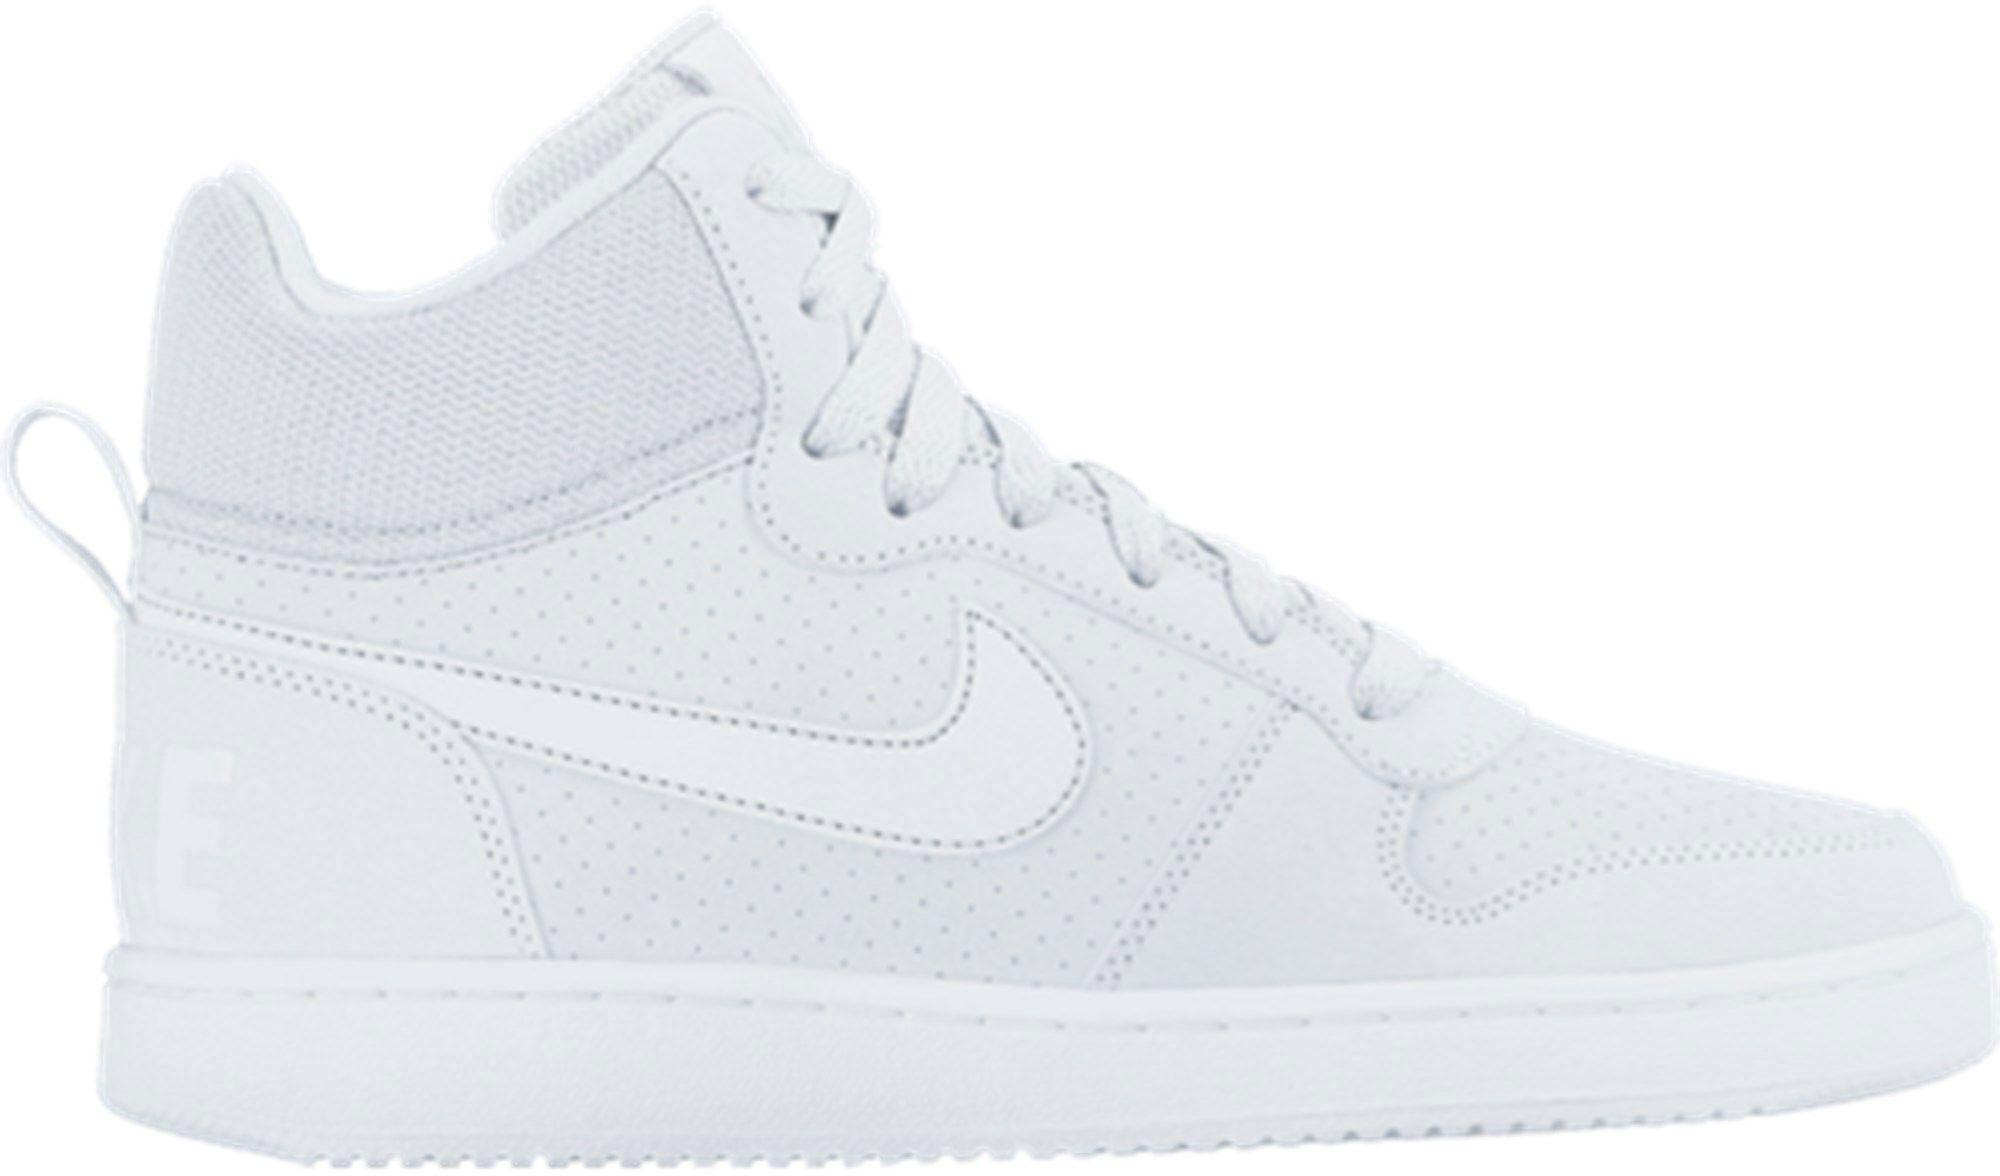 Nike AIR MAX Thea Ultra SI Dame Sort 881119 003